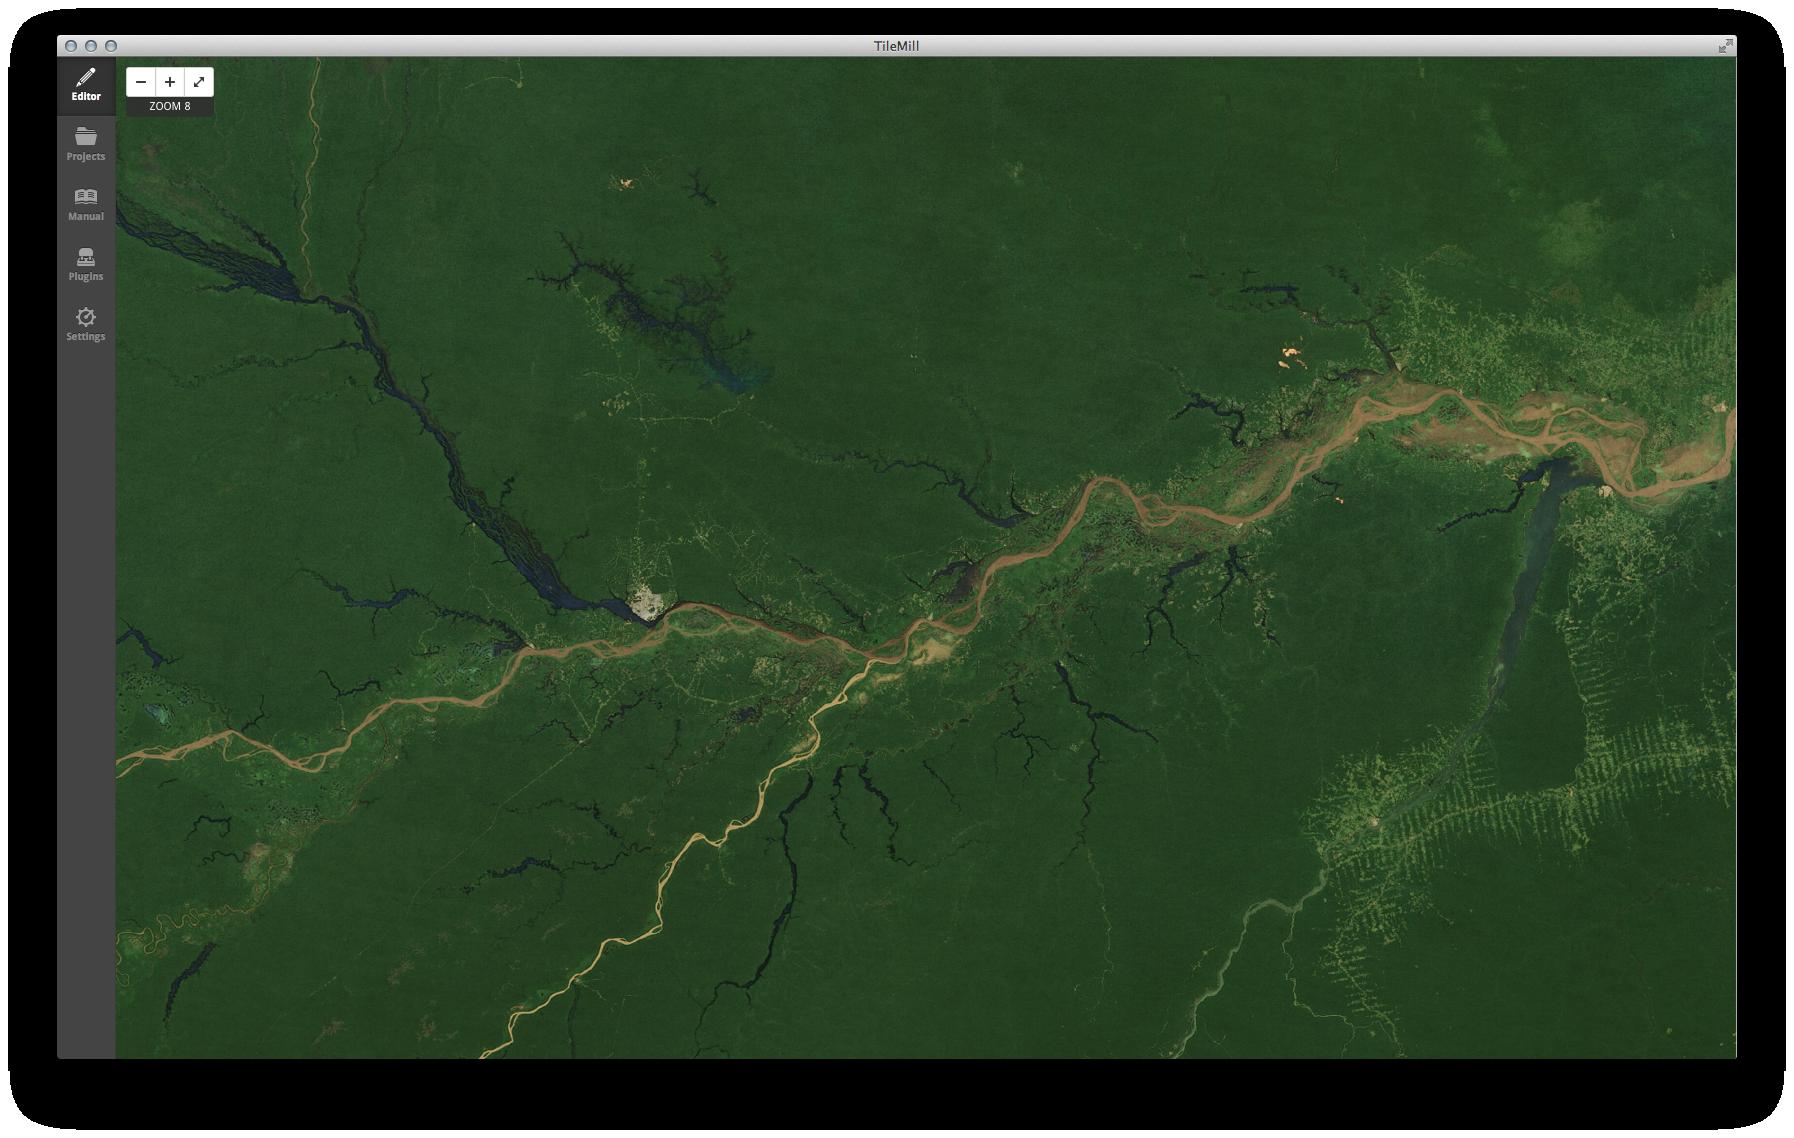 Manaus, Brazil (latitude −3, longitude −60)